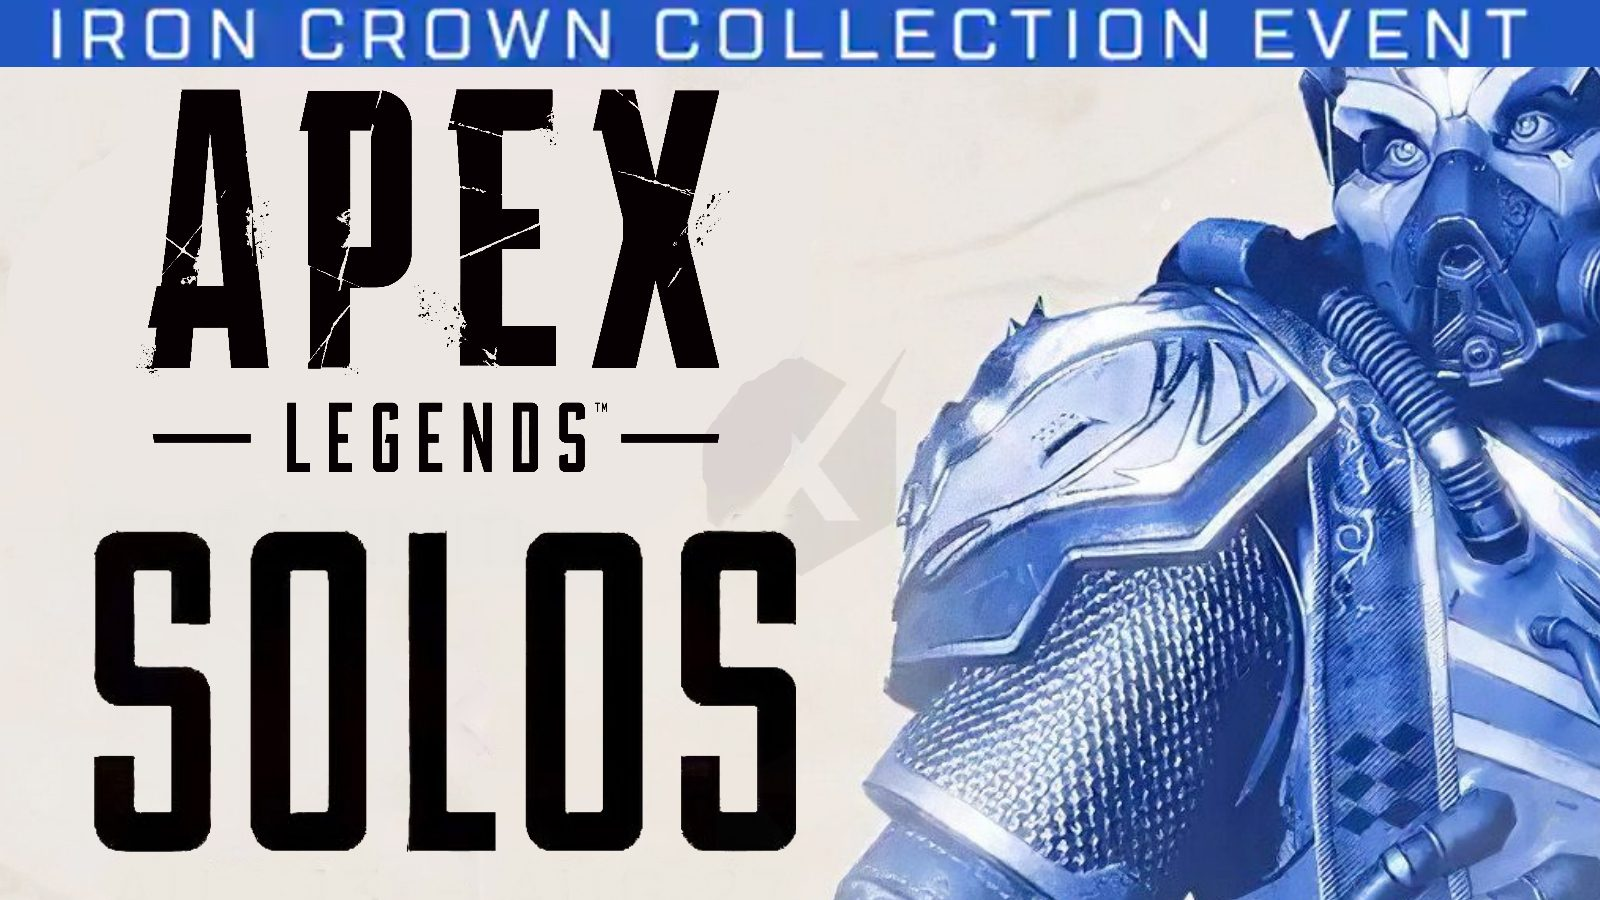 Apex Legends Iron Crown Event